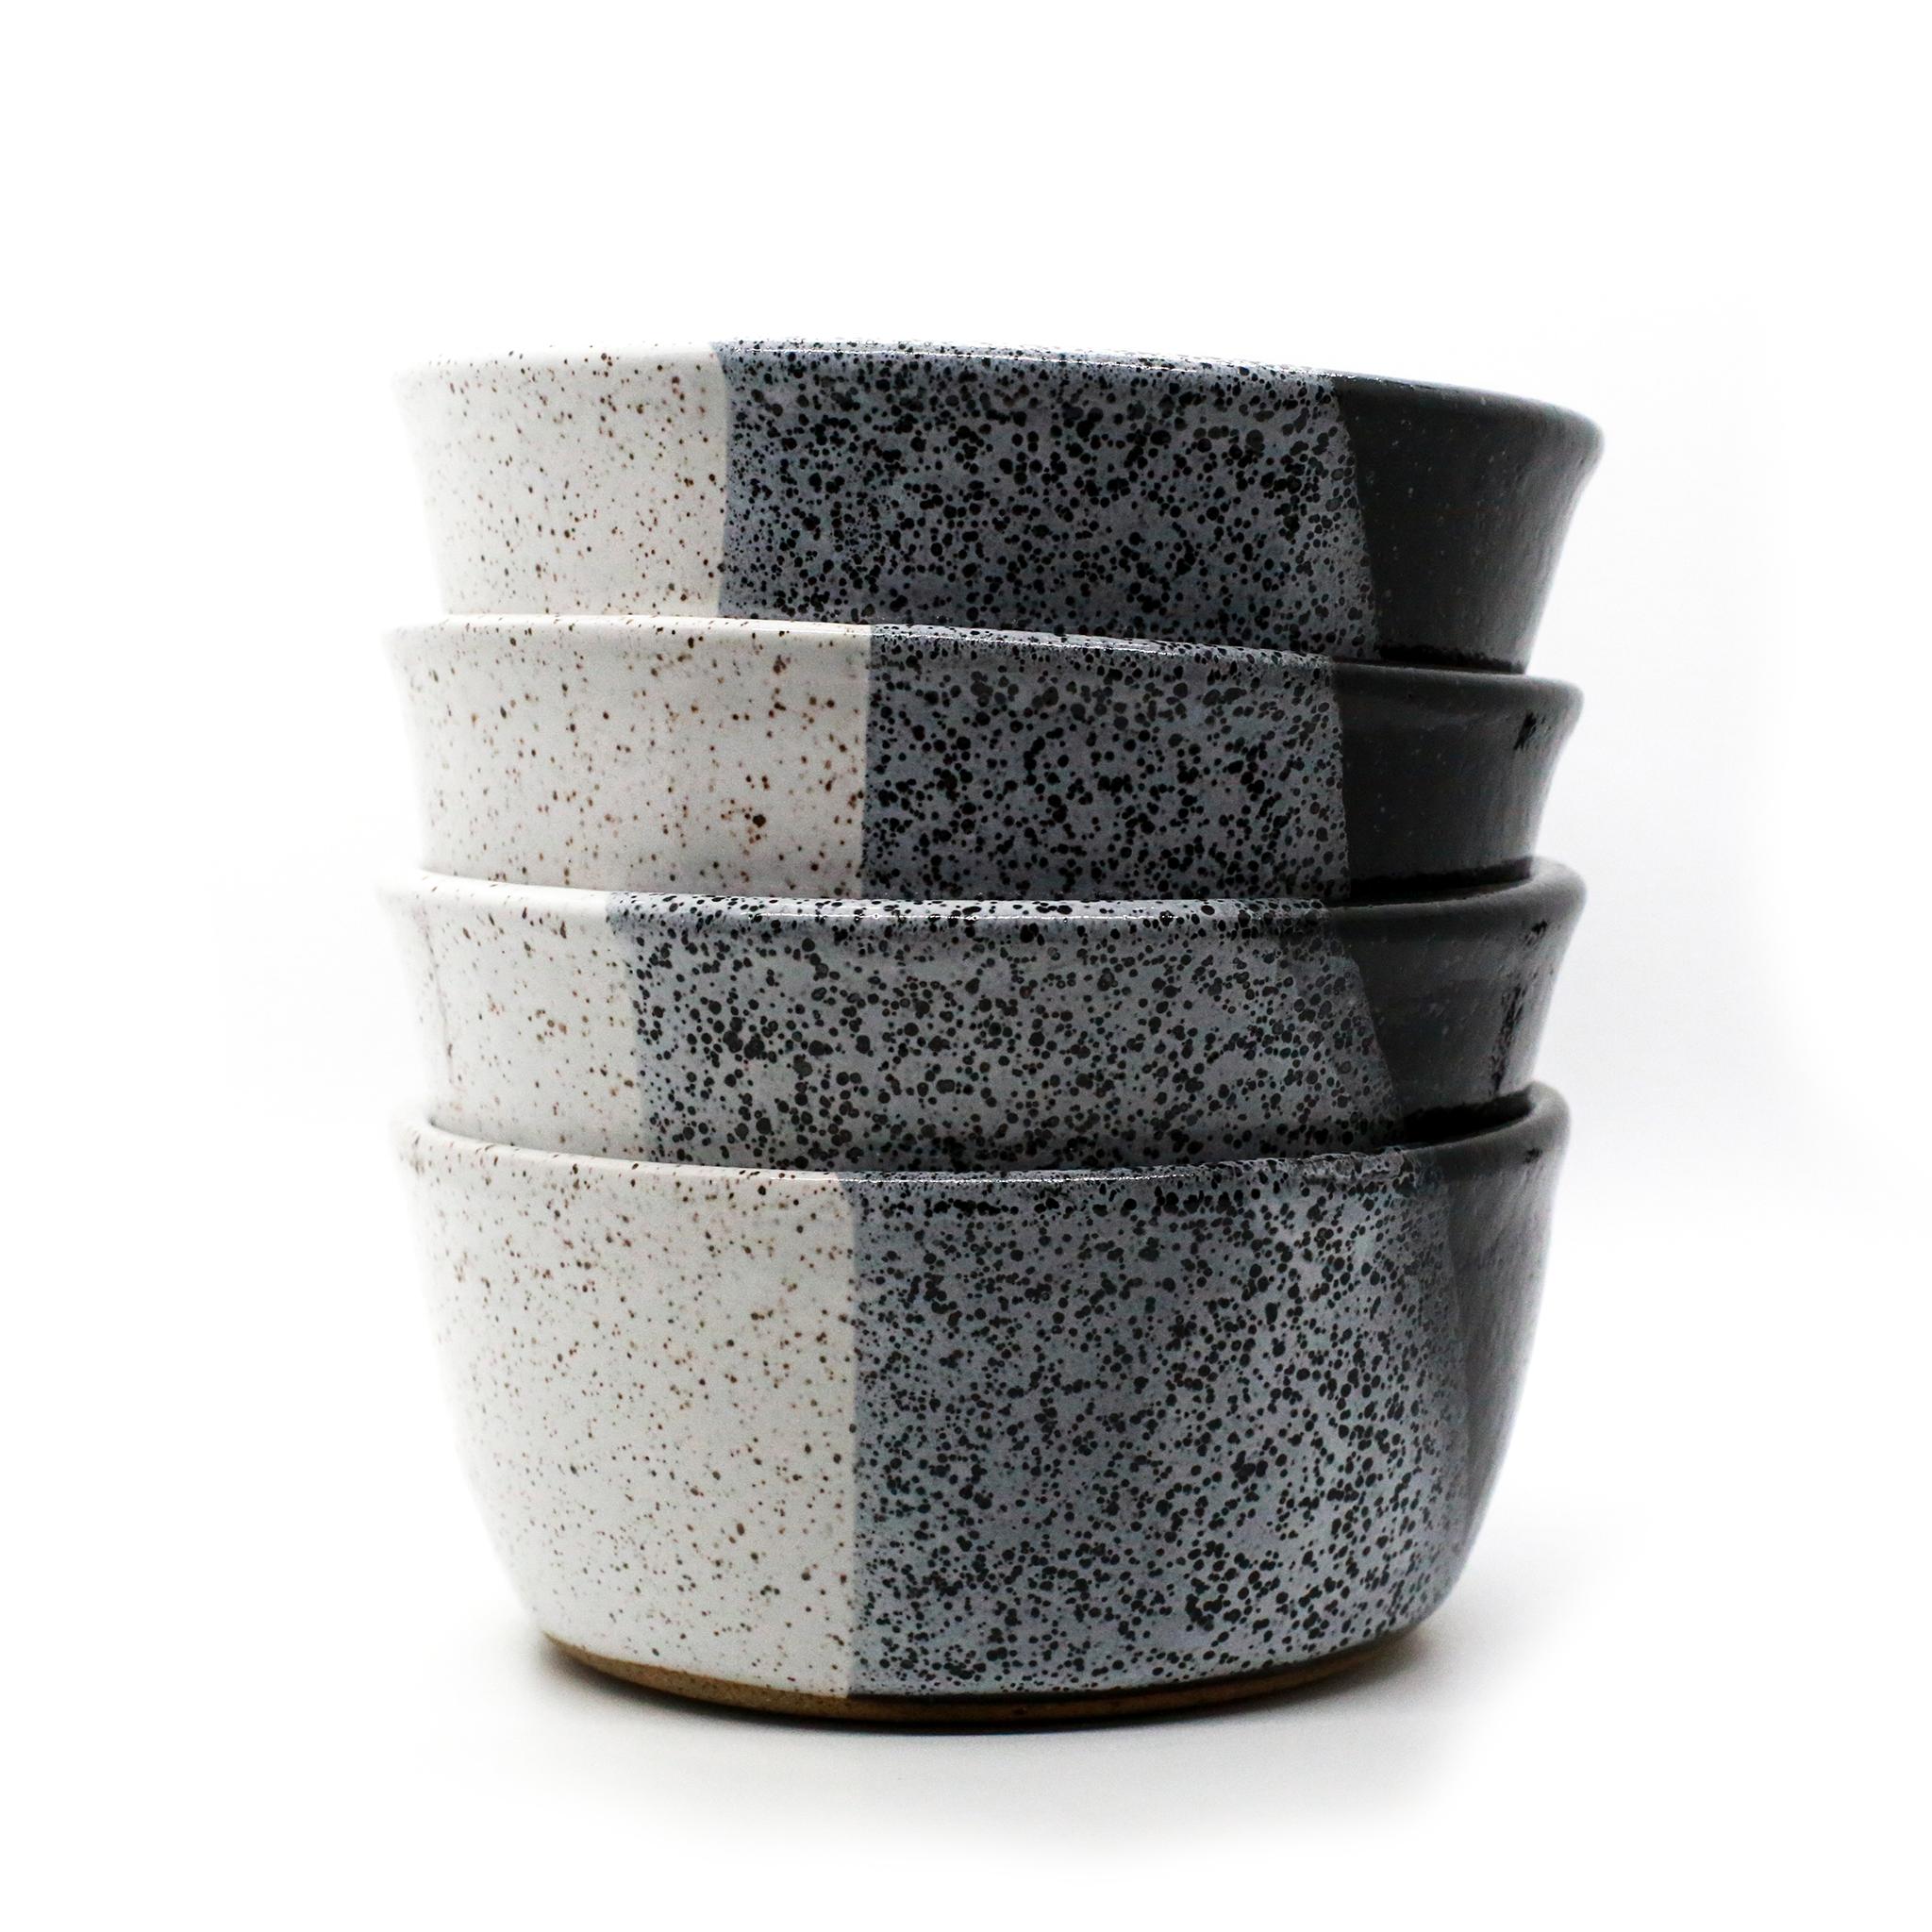 Black & White Cereal Bowls (4)